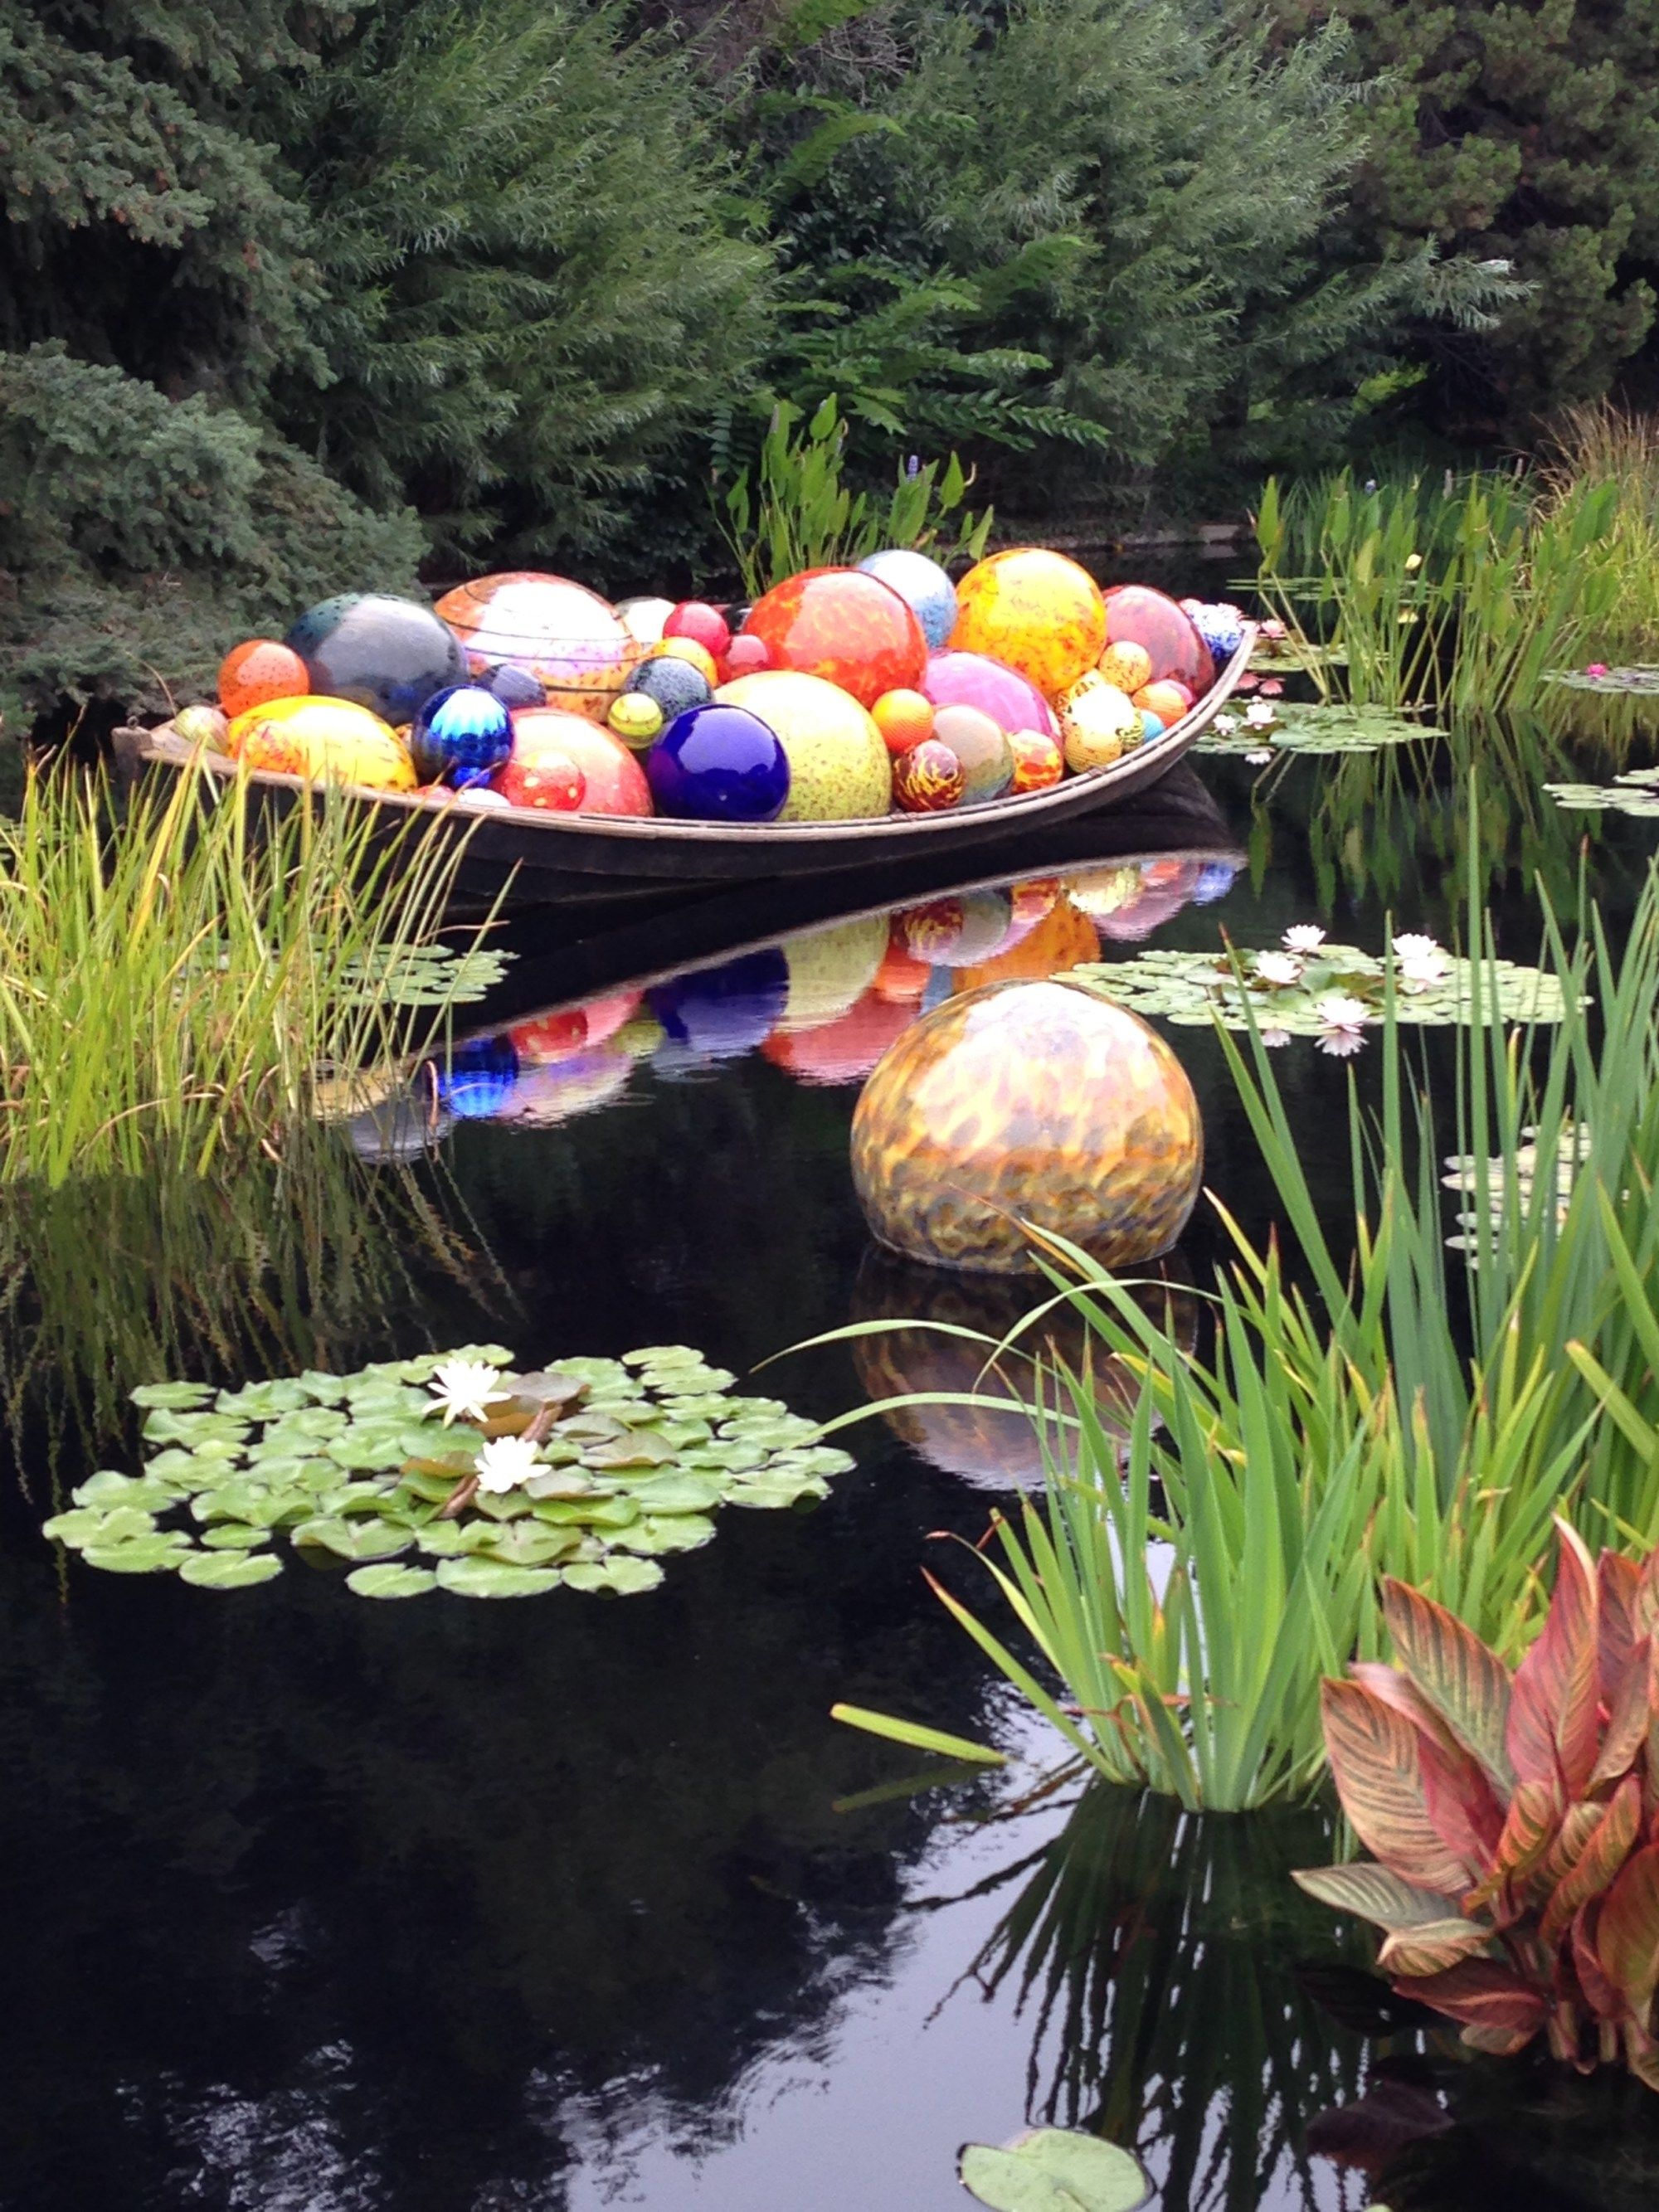 36f7678f1511067f4c4bd16f73b17603 - Chihuly Exhibit At Ny Botanical Gardens